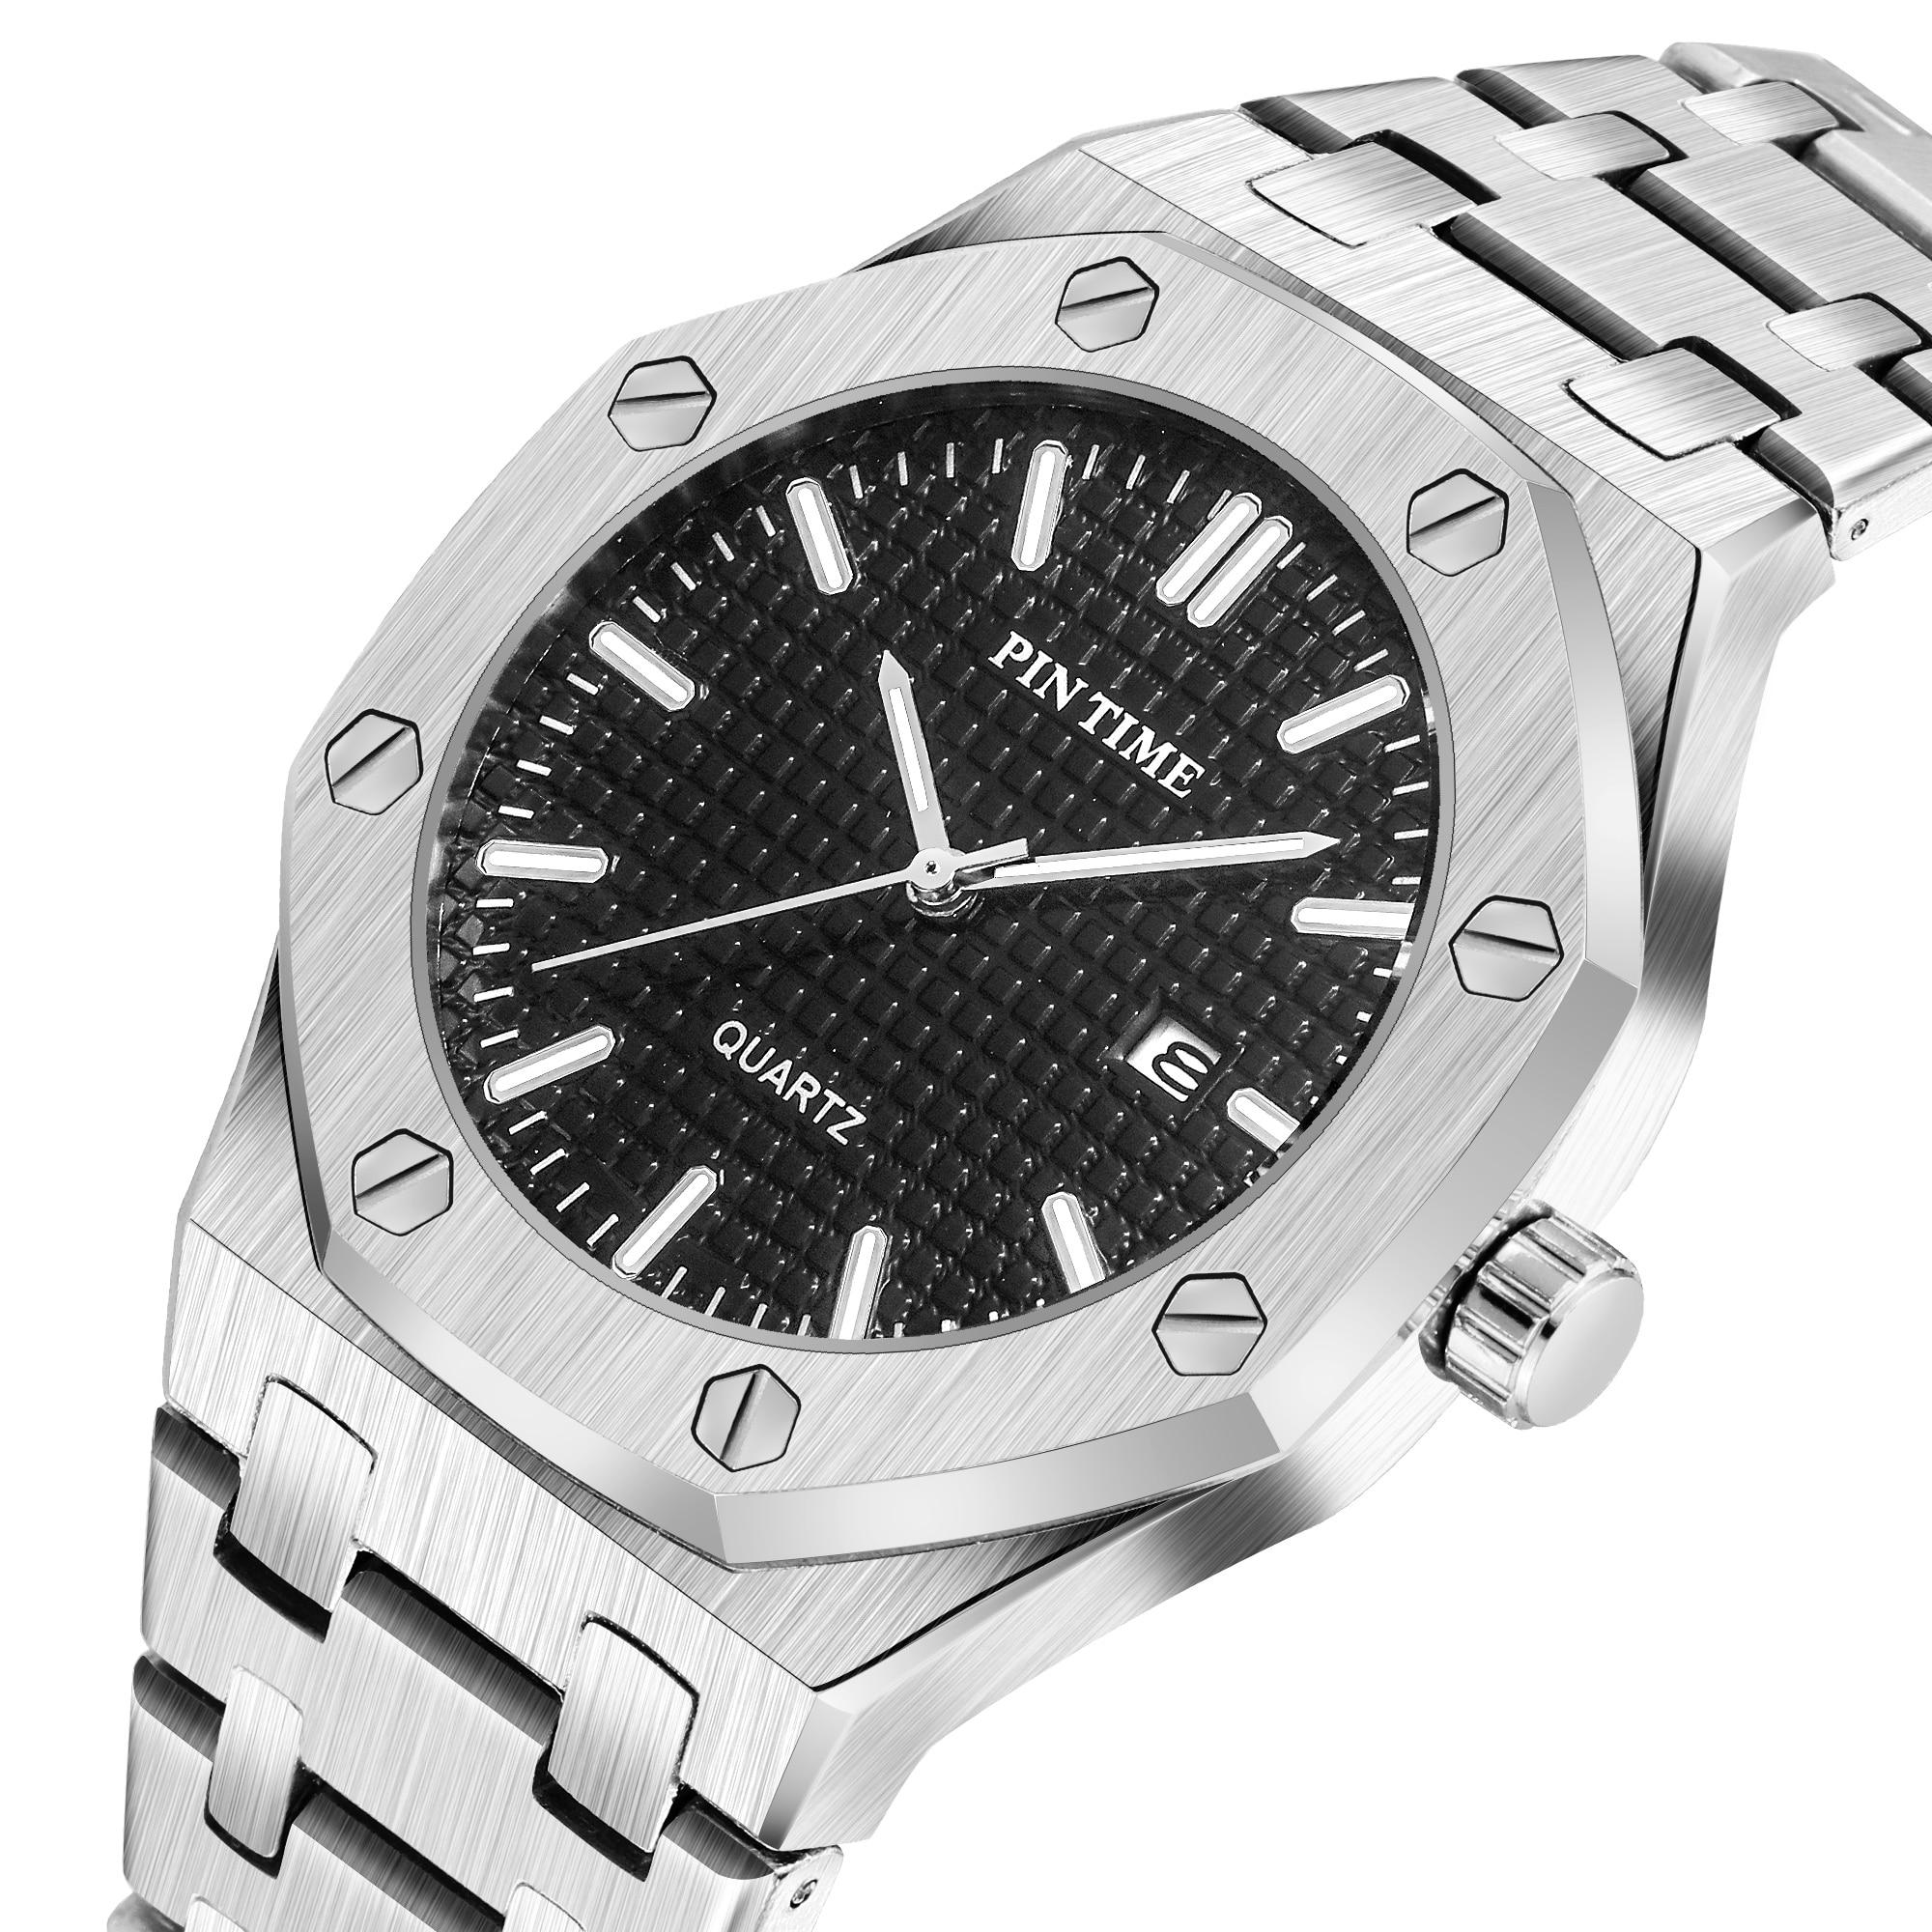 Gold Mens Watches Top Brand Luxury Men's Fashion Simple Quartz Watch Men Sport Steel Date Clock Relogio Masculino Reloj Hombre